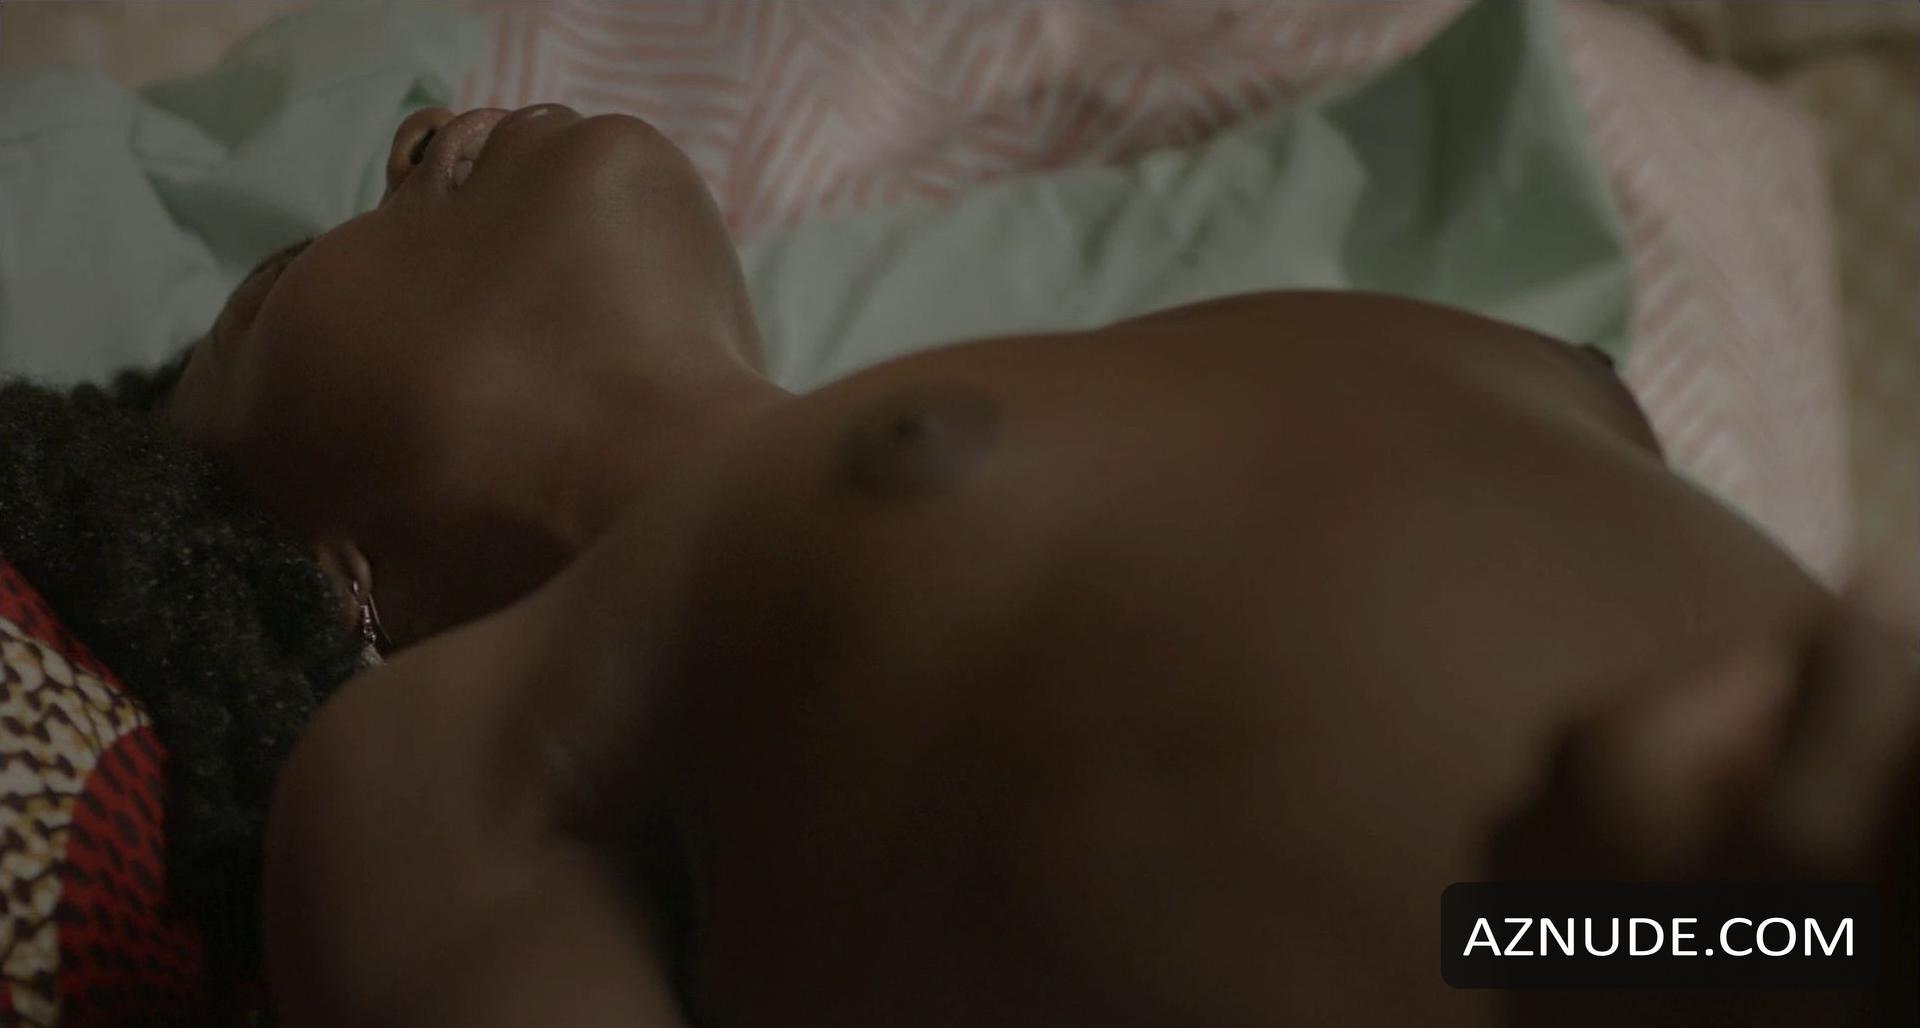 Nude Lesbian Free Videos